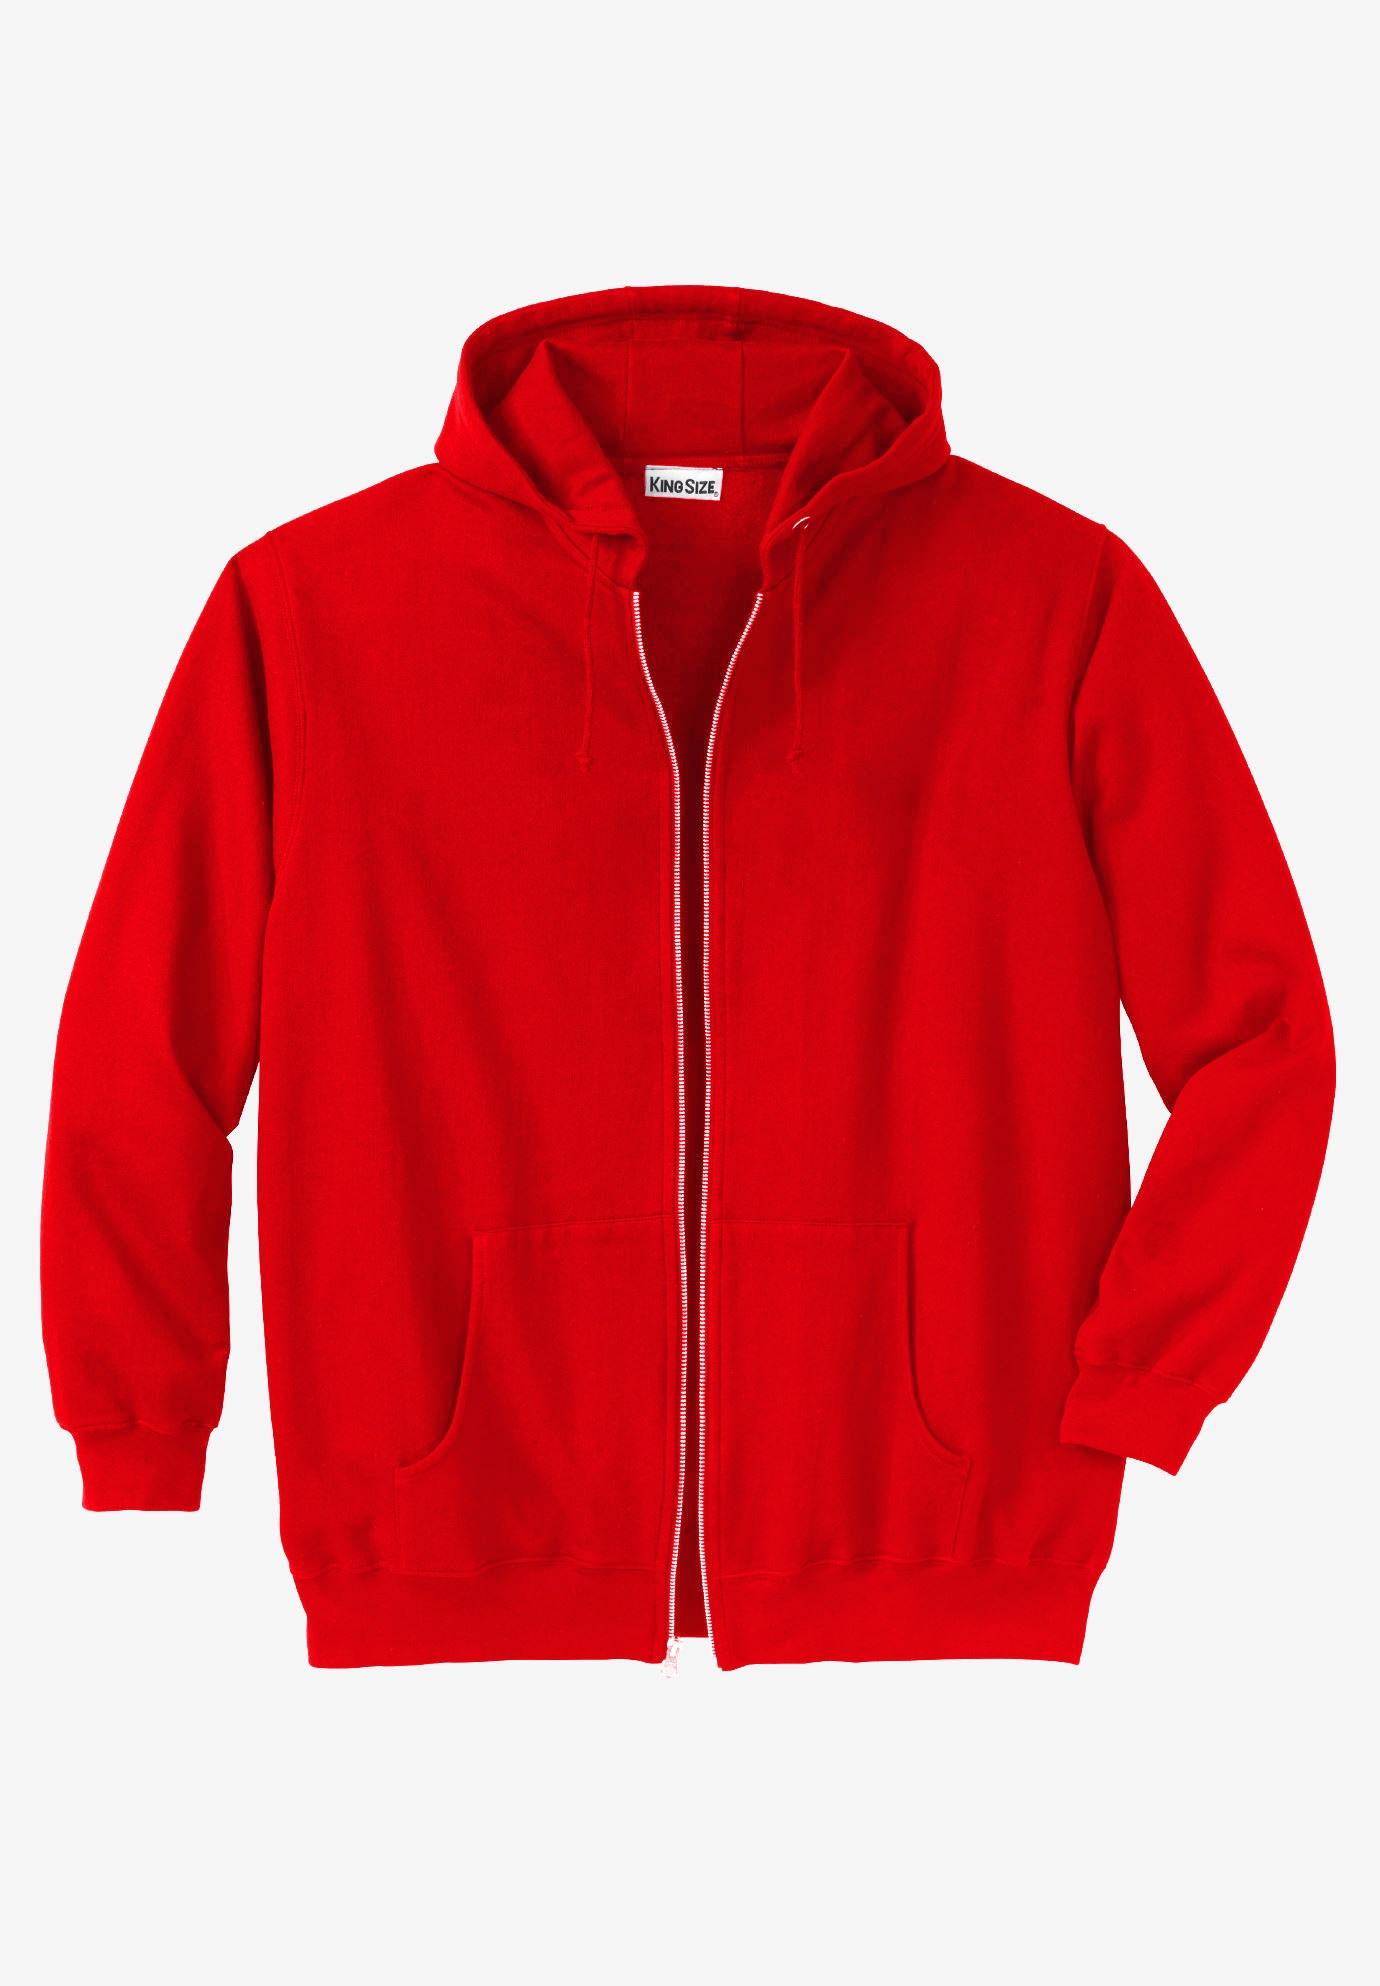 56dff7842 Fleece Zip-Front Hoodie | Plus Size Outerwear | King Size